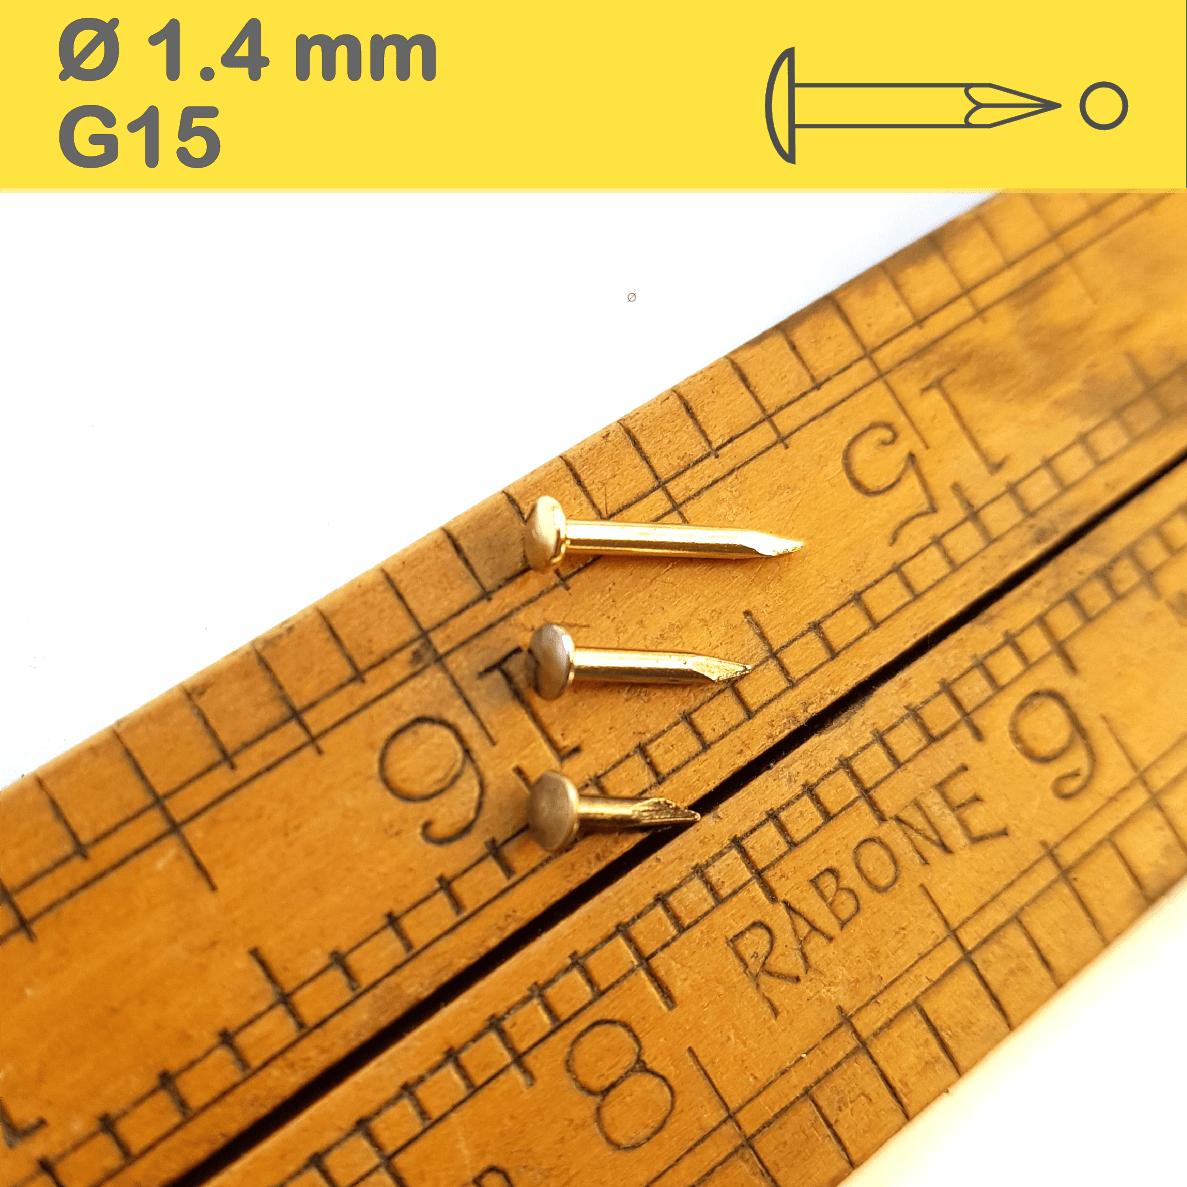 Brass Patina Antique Vintage NailsDekonägel Rundkopfstifte Messing Patiniert Antiquität Drahtstifte